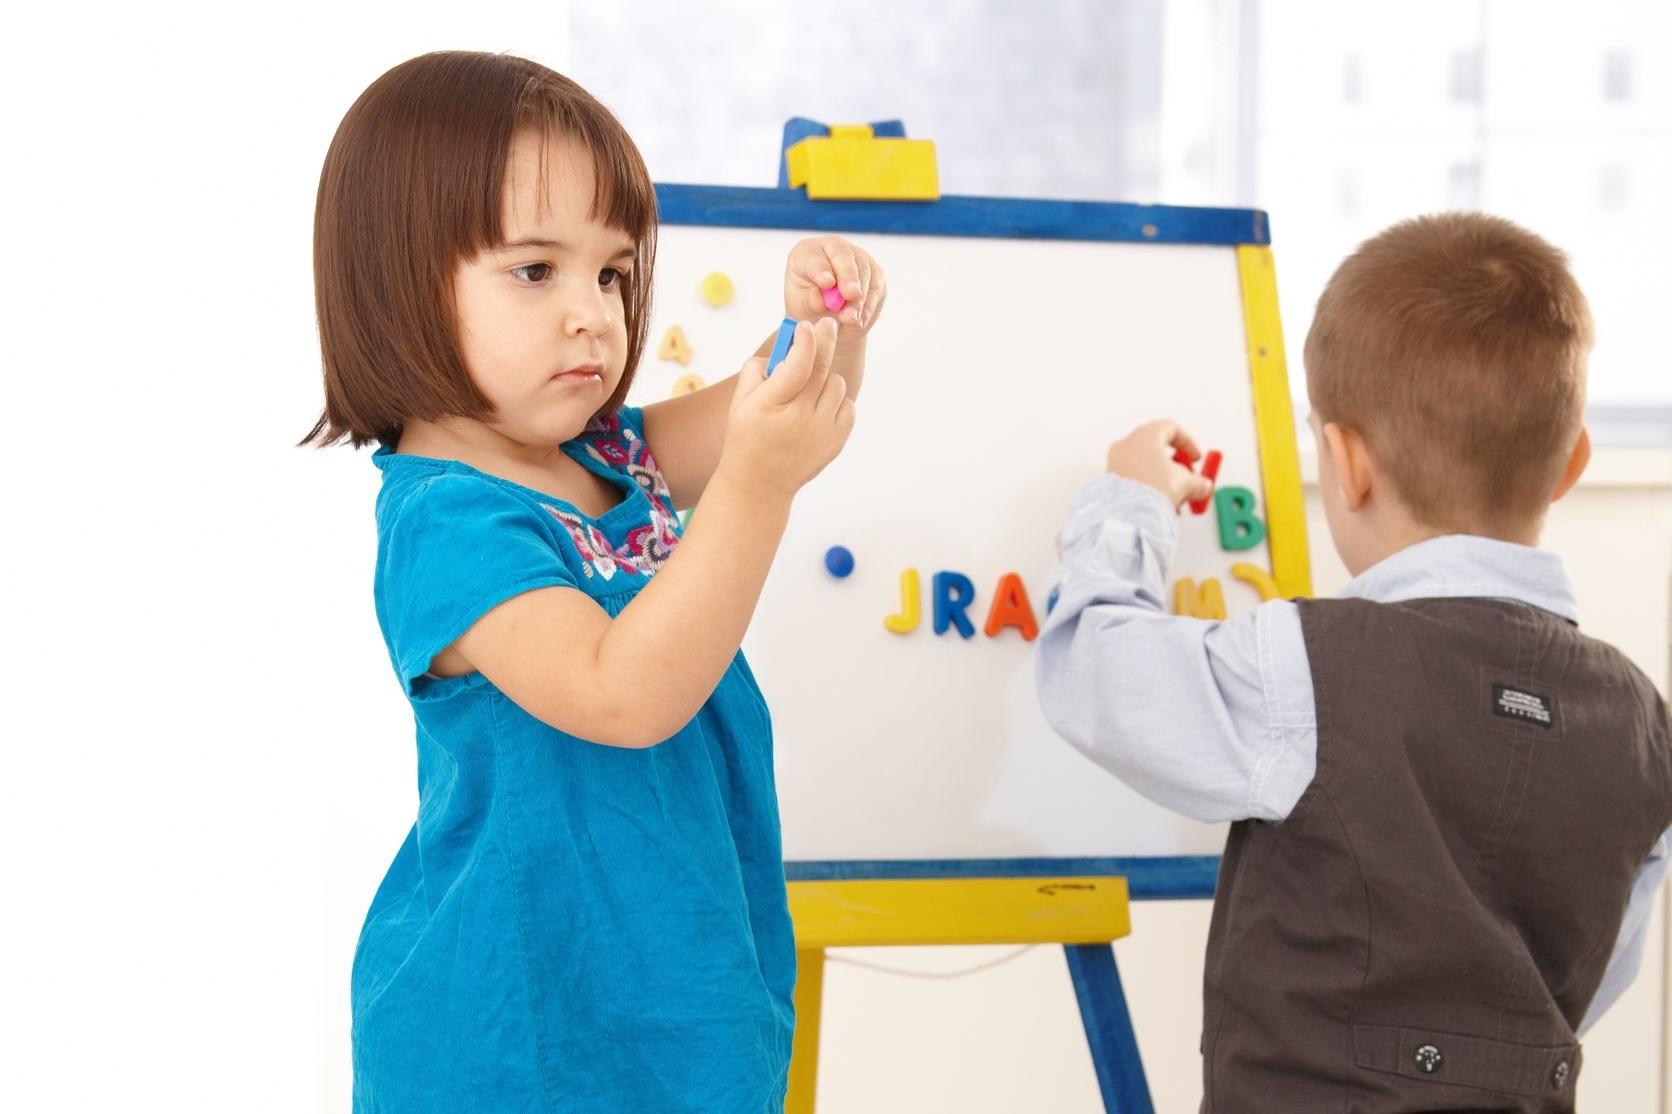 niña jugando con pizarra